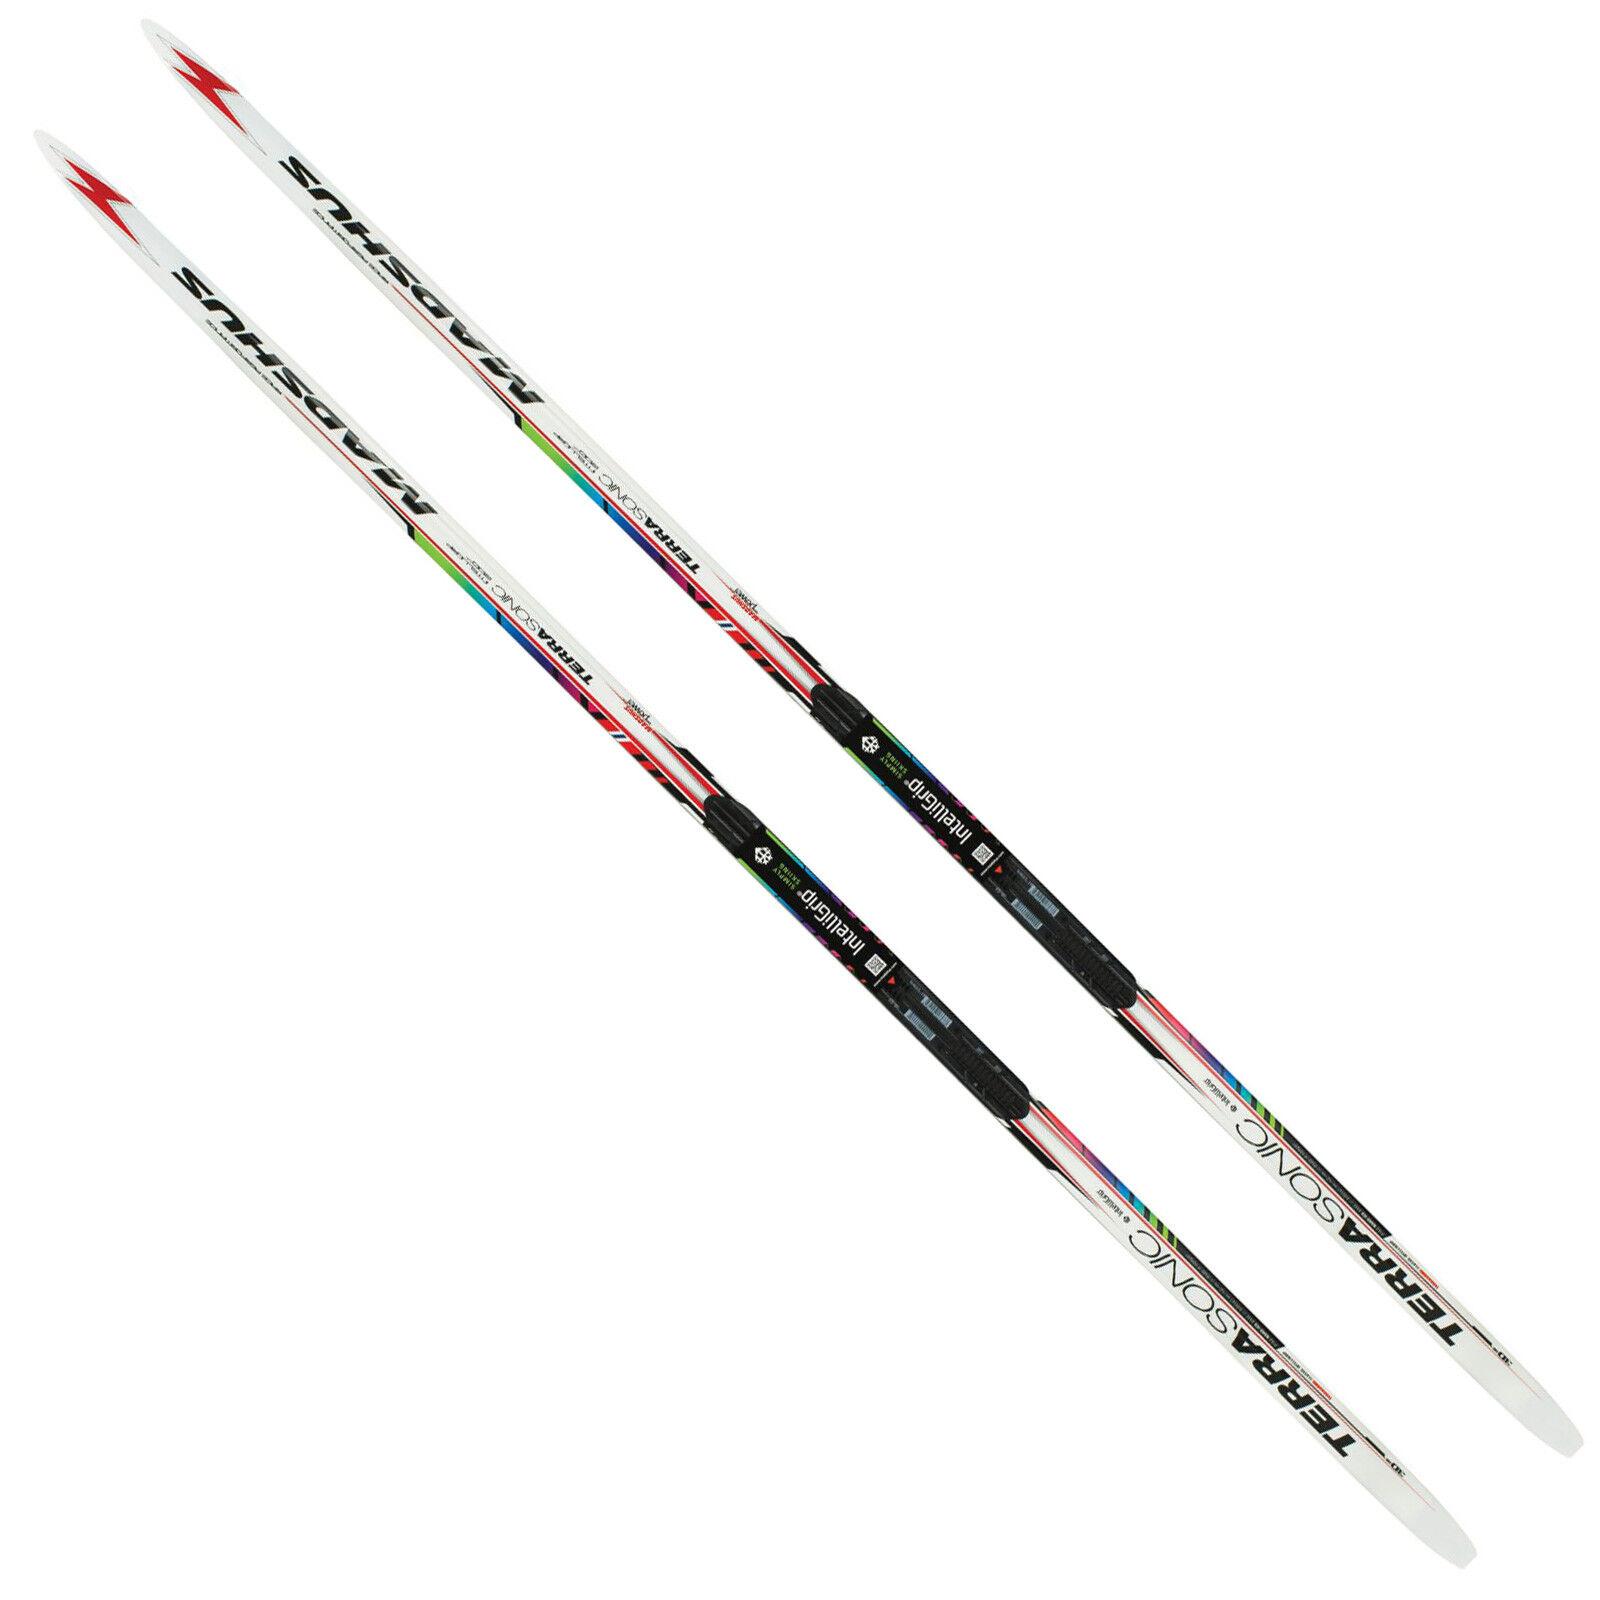 Madshus Terrasonic Intelligrip Unisex-Langlaufski klassischer Langlauf Ski NEU